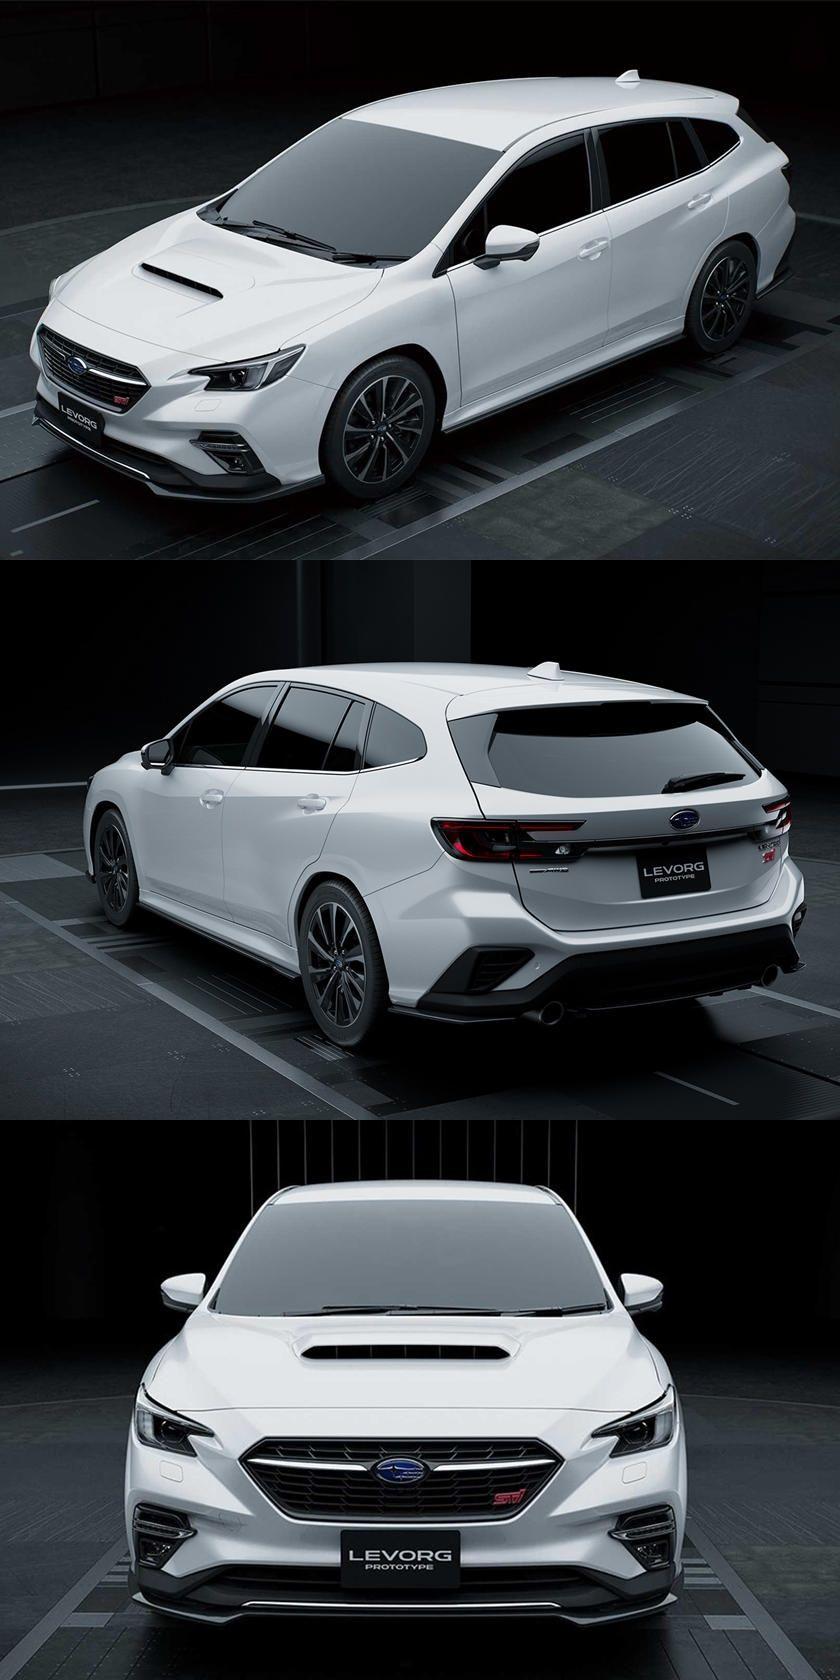 This Is The Hot Subaru Wrx Sti Sport Wagon We Want Sadly We Cant Have It In 2020 Sports Wagon Subaru Subaru Wrx